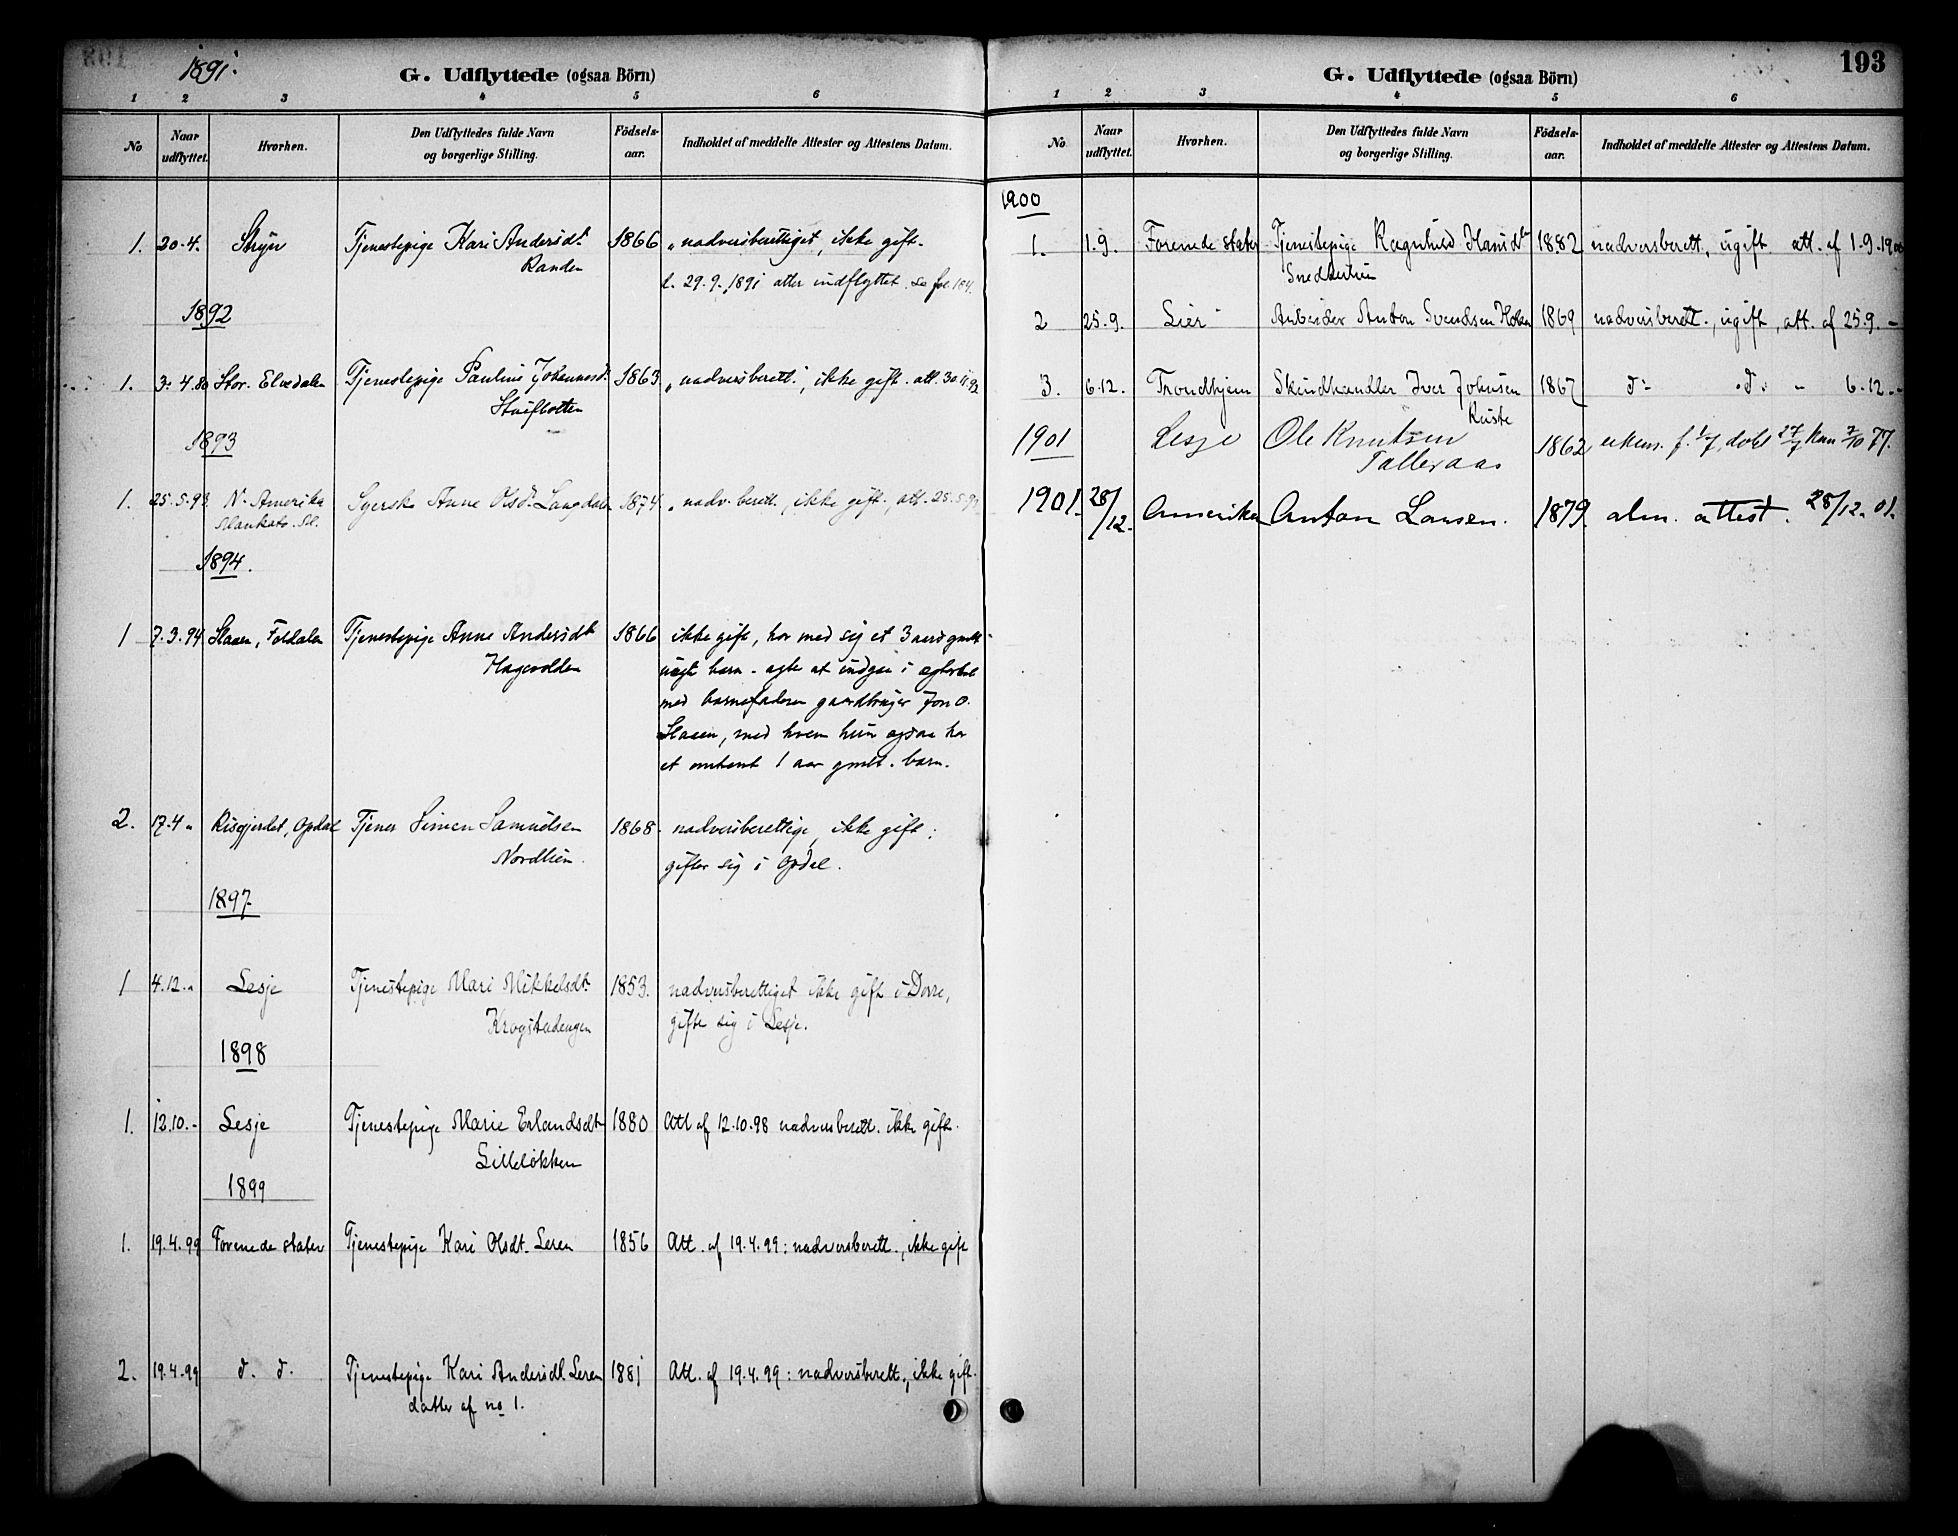 SAH, Dovre prestekontor, Ministerialbok nr. 3, 1891-1901, s. 193